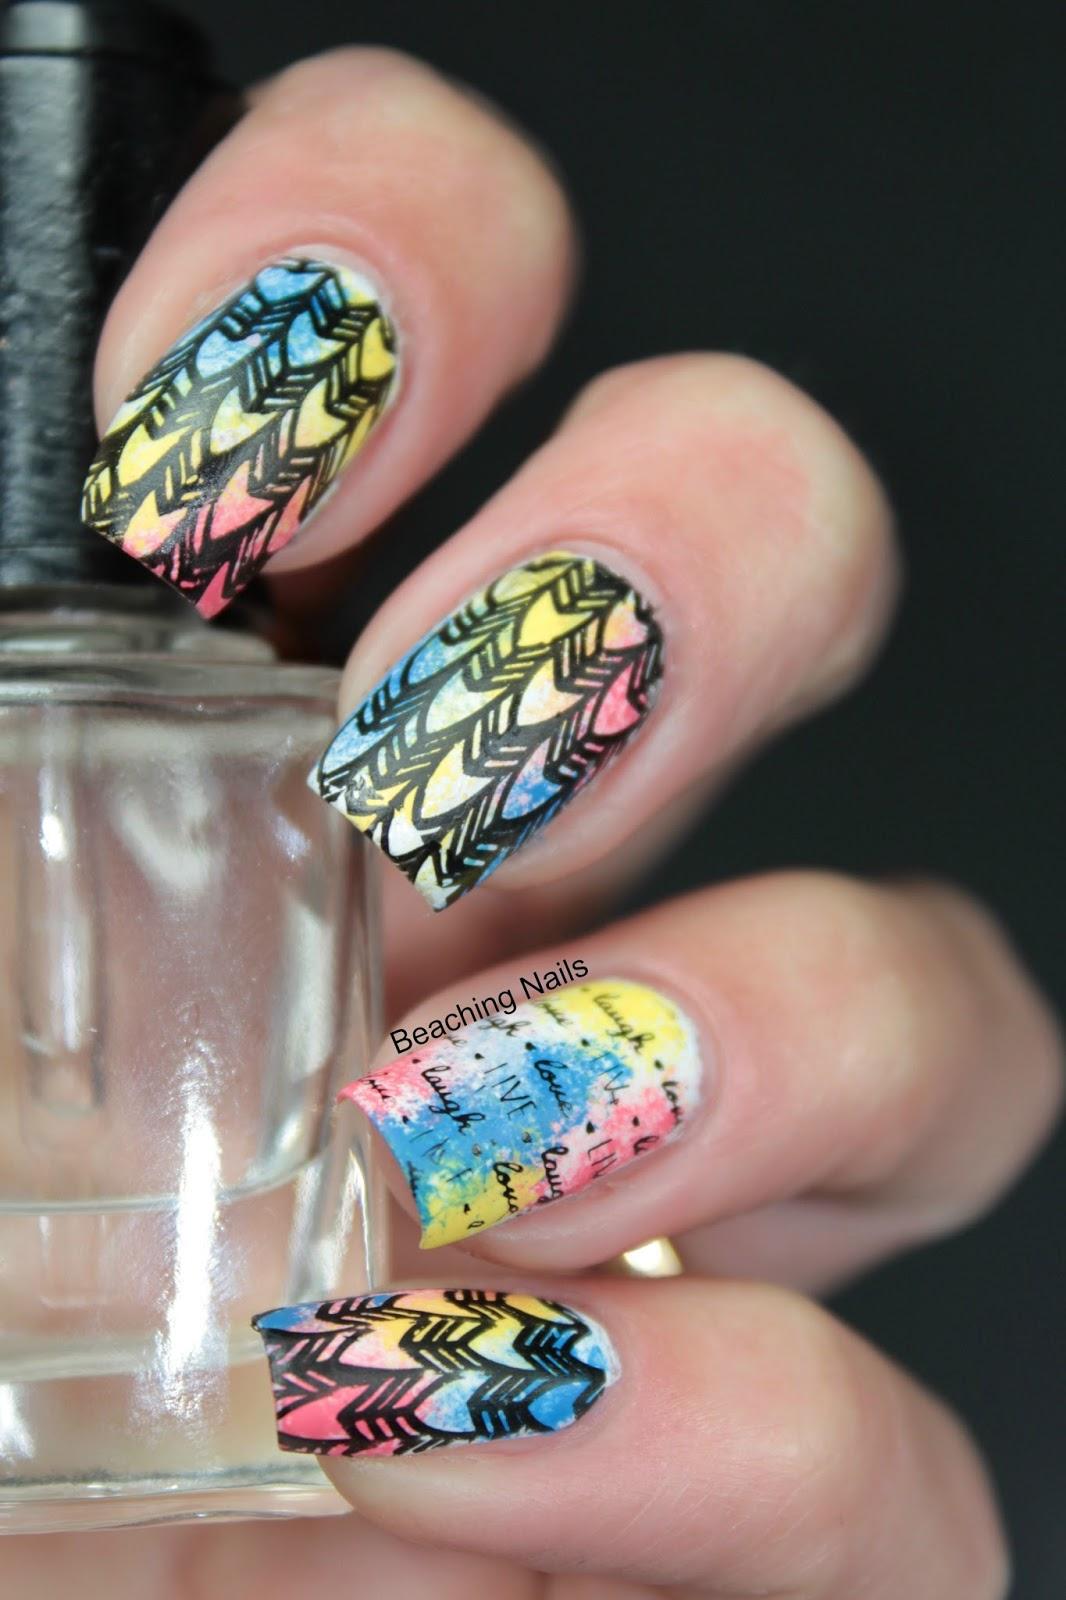 Surfer Girl aka Beaching Nails: Sponge Mani with Acrylic Paint and ...